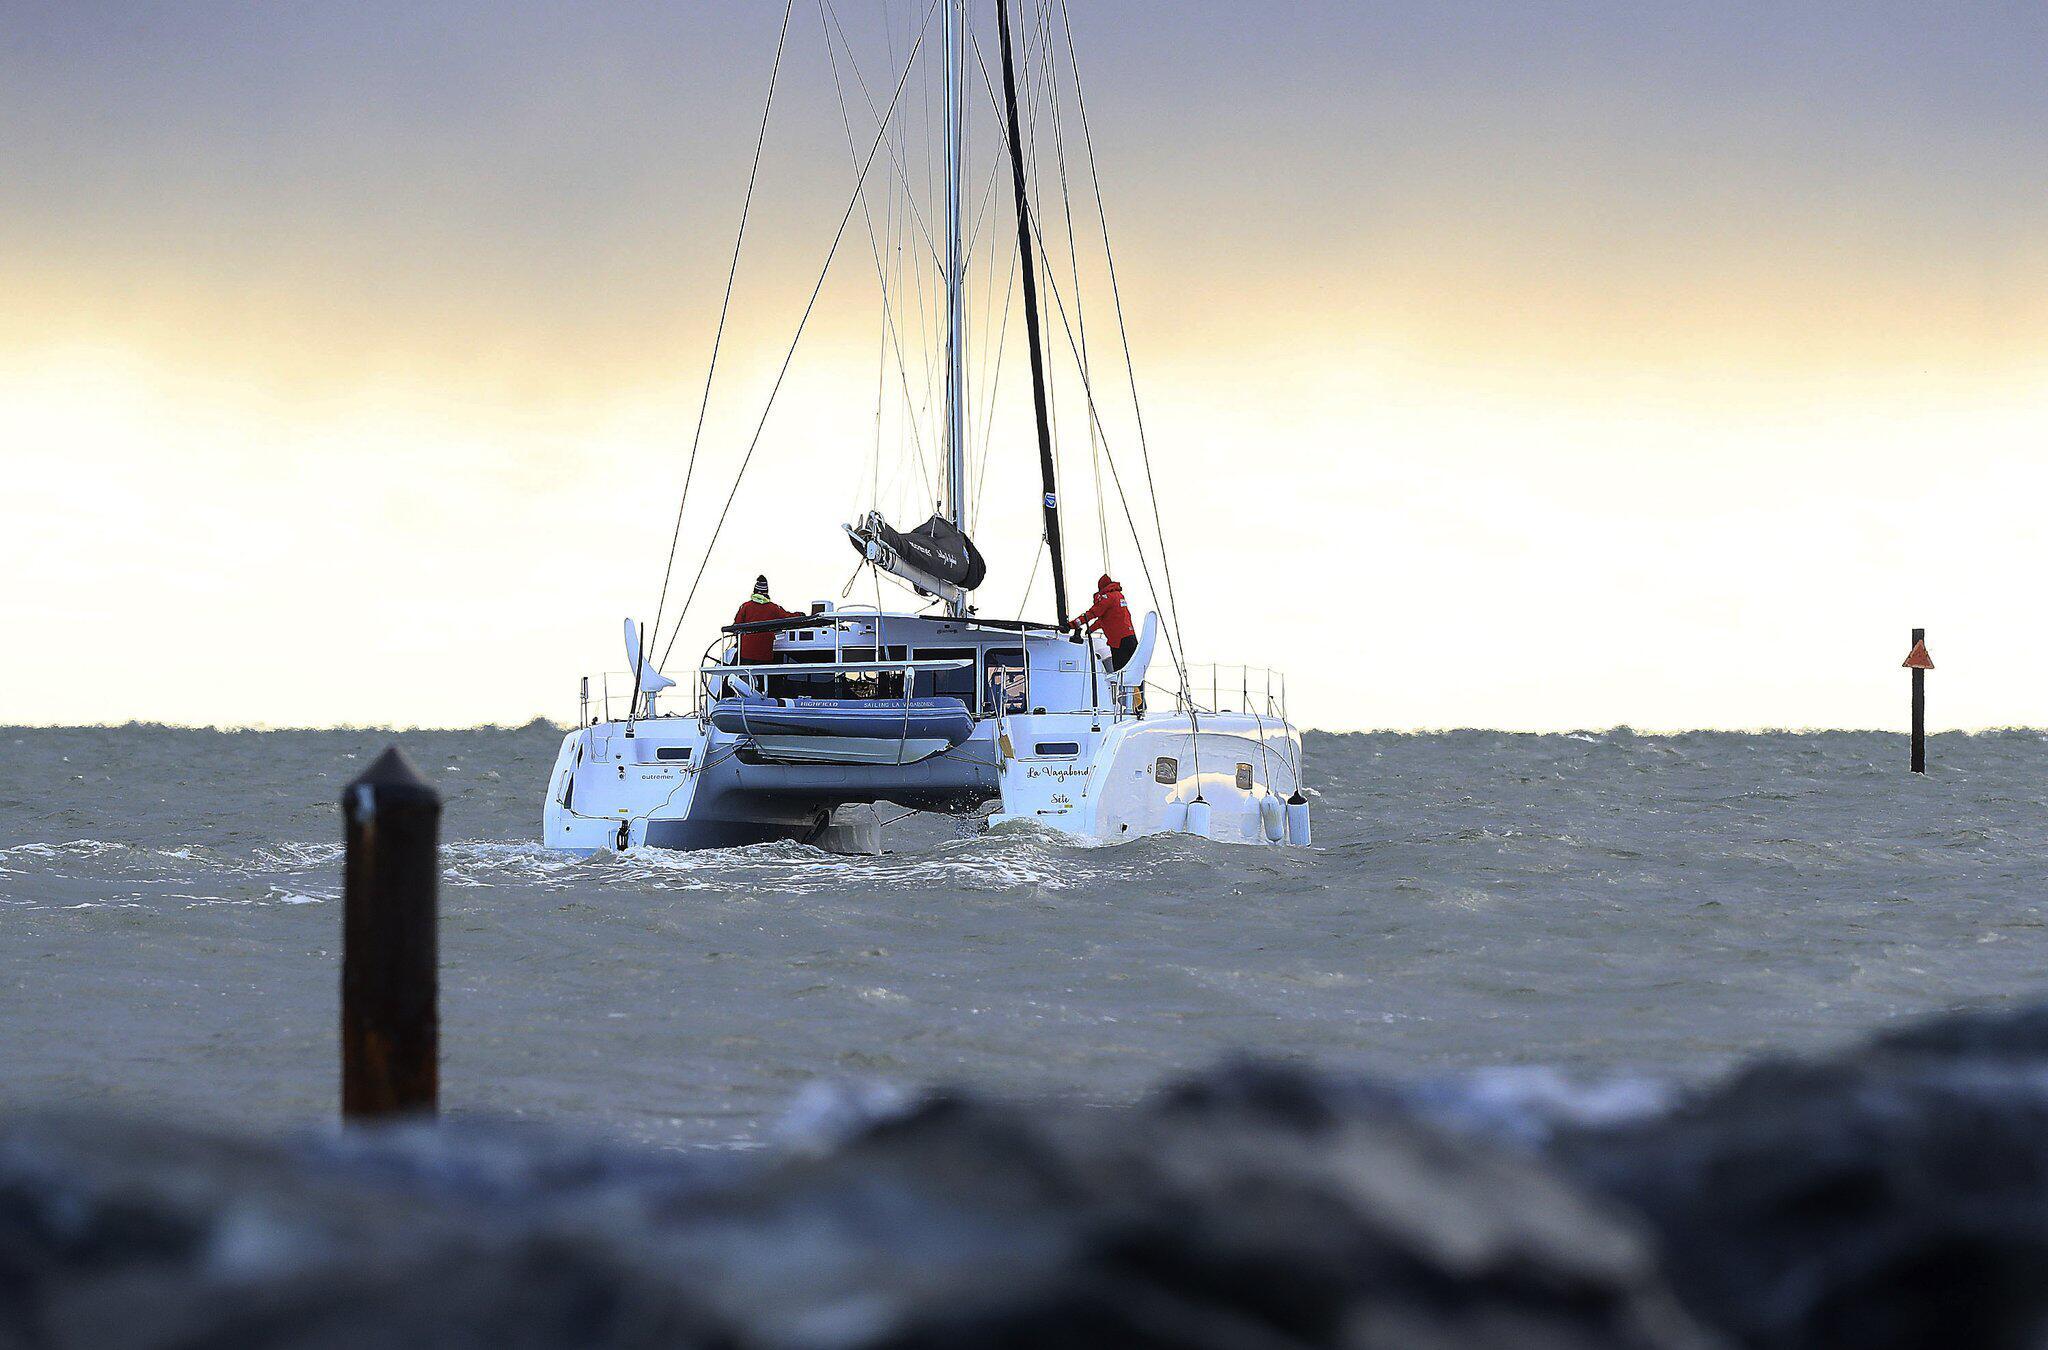 Bild zu Thunberg hofft auf Ankunft in Europa Anfang Dezember